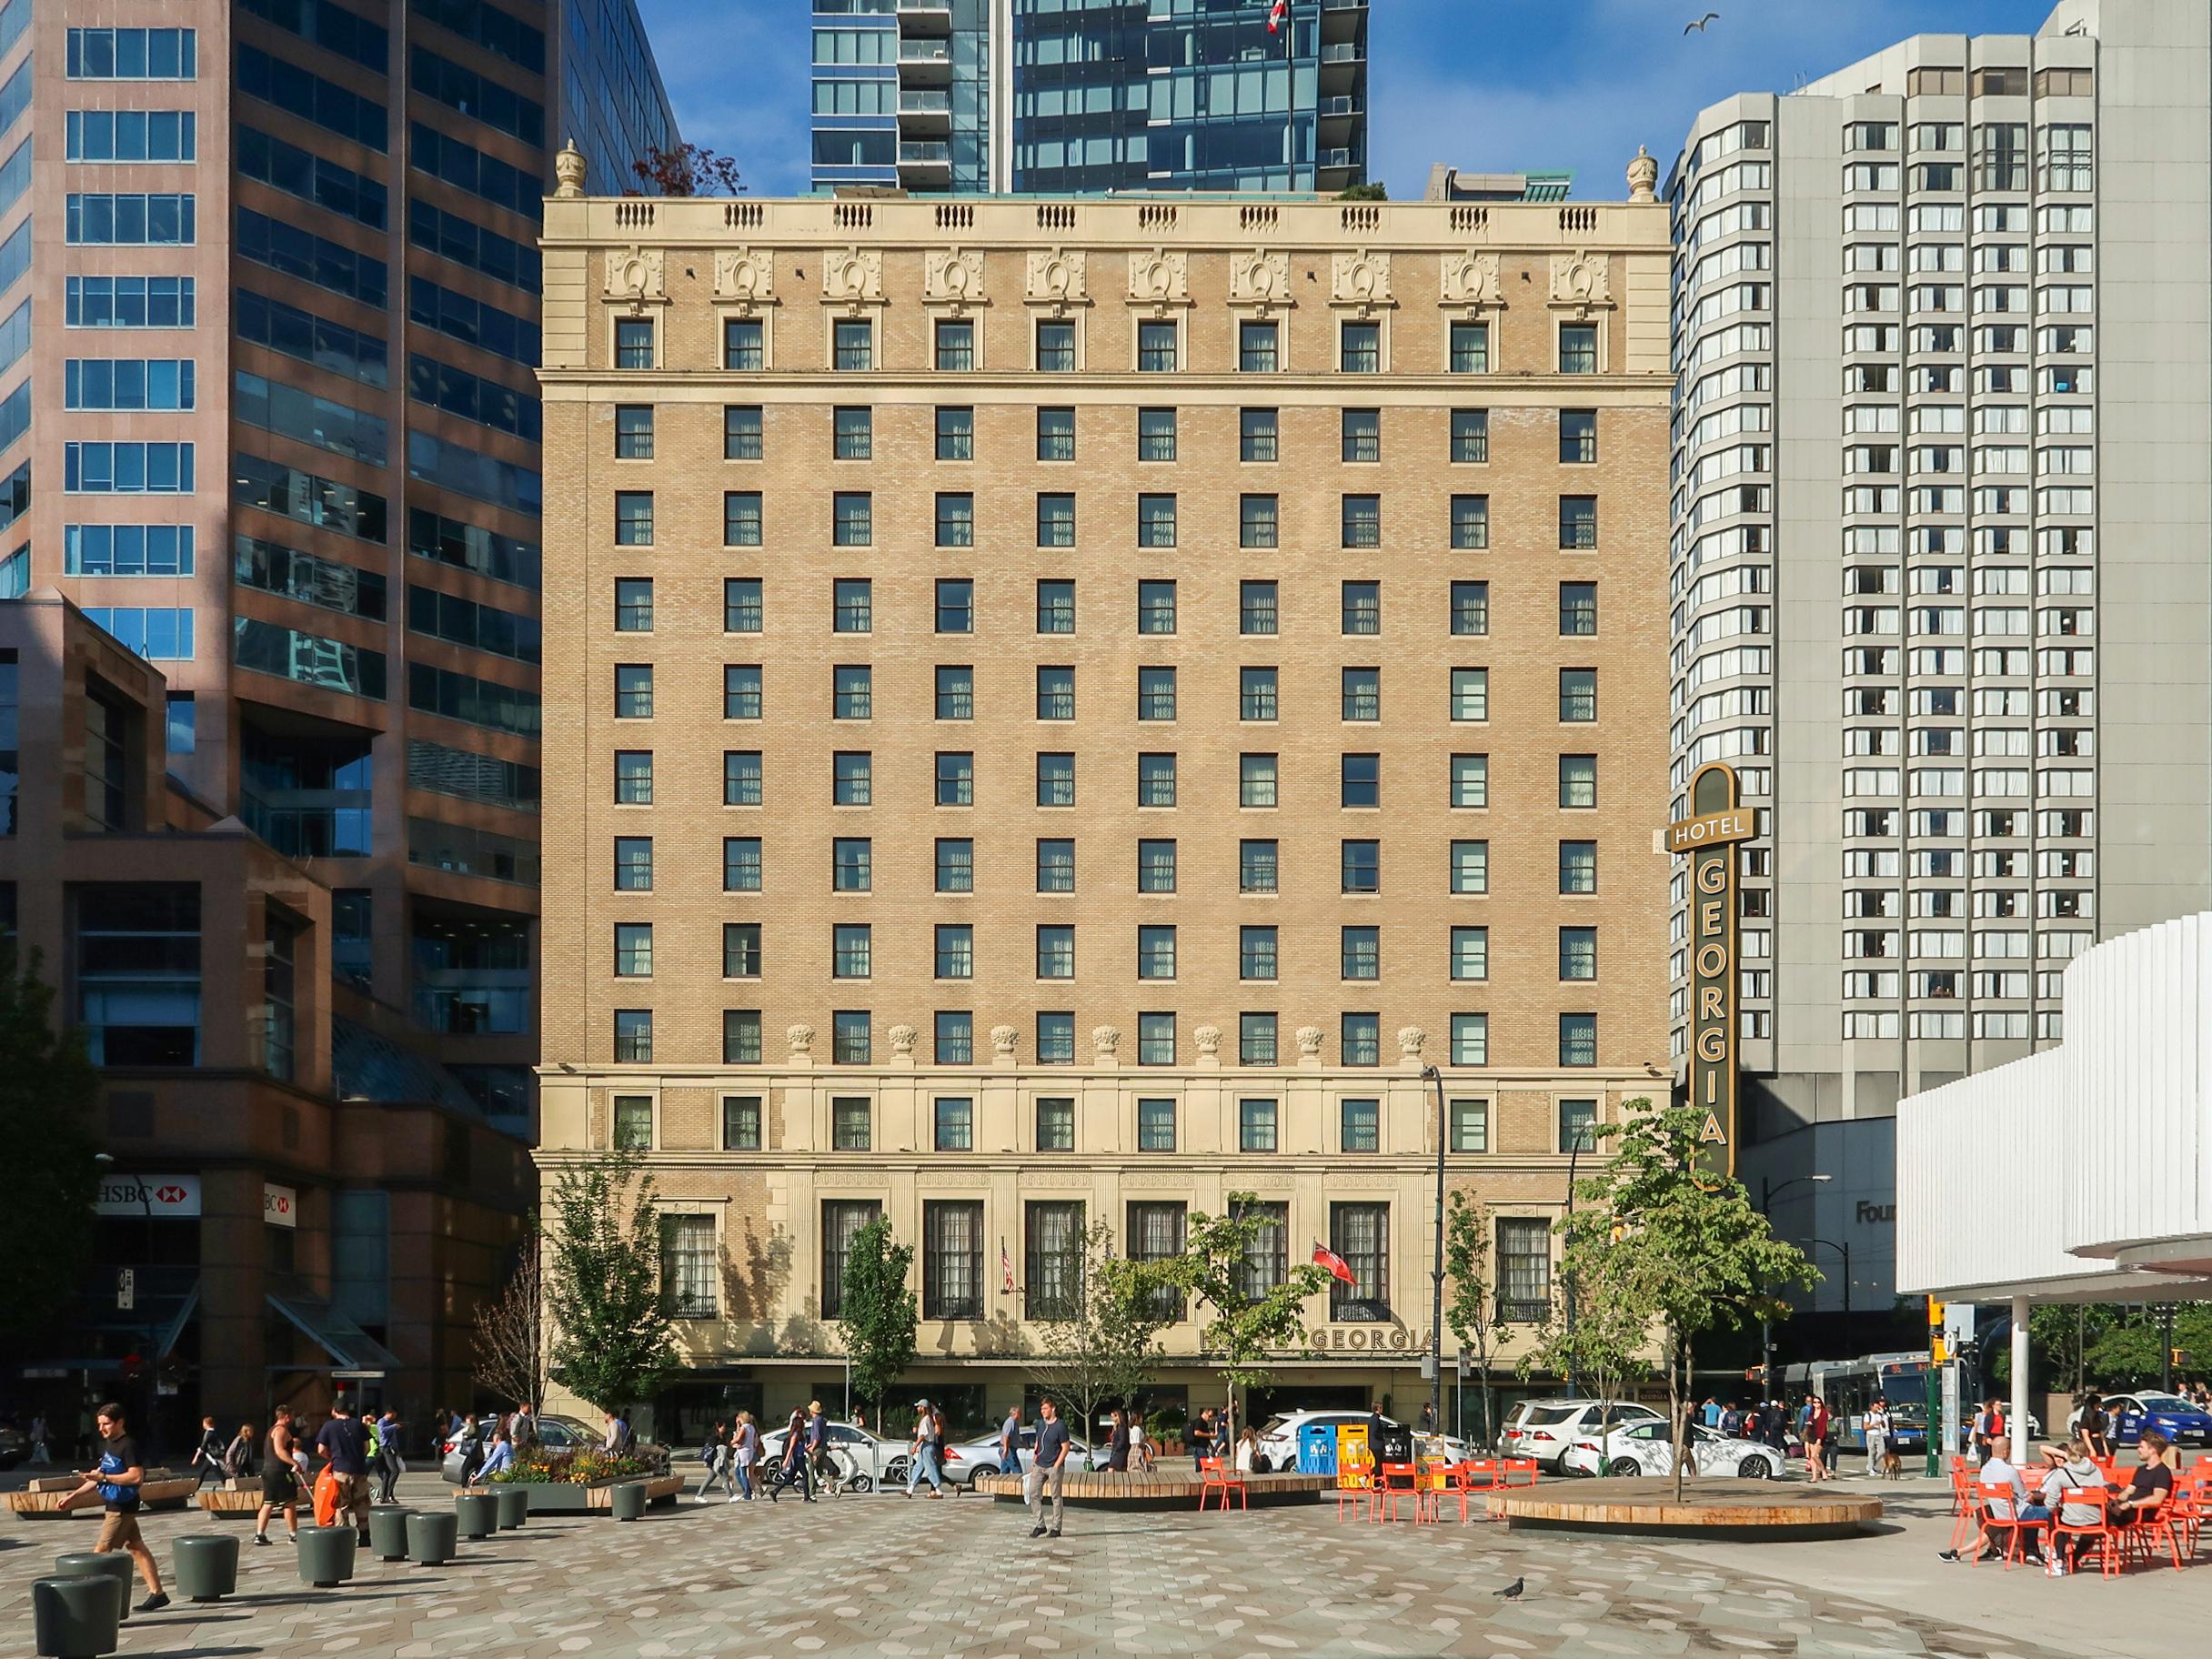 Hotel Georgia (Vancouver) - Wikipedia